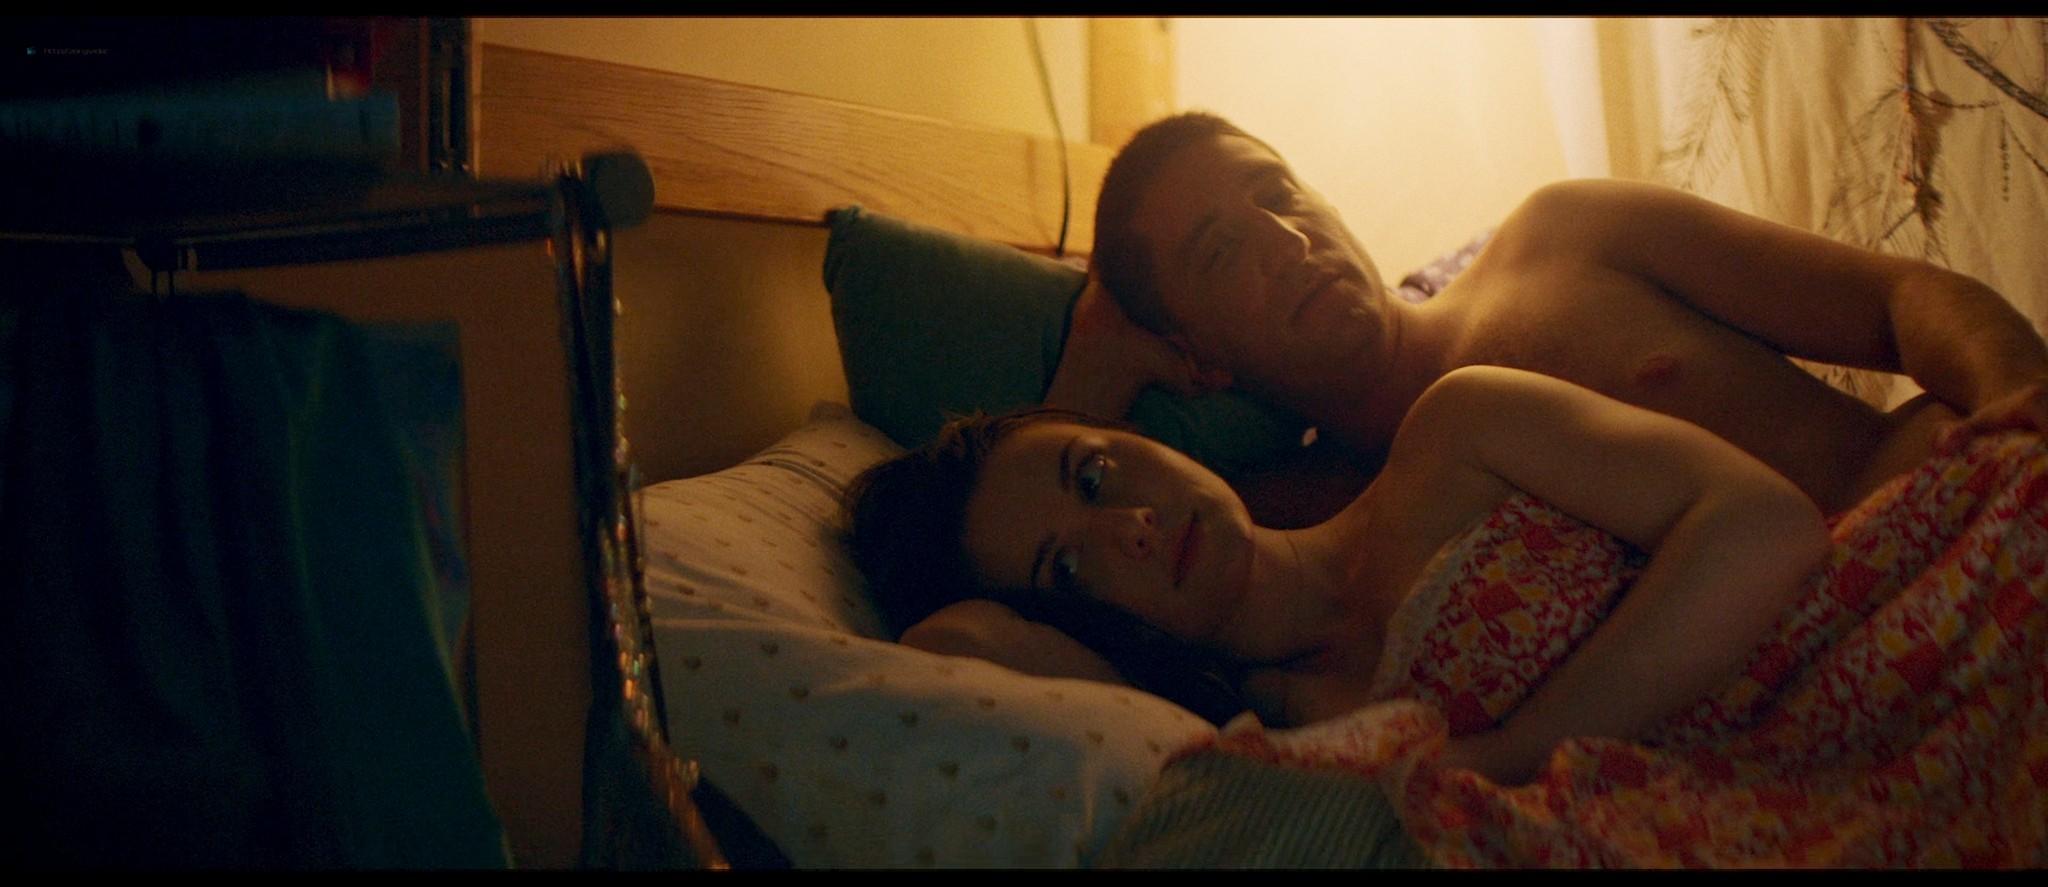 Ellen Toland nude topless Katie Claire McGrath sex doggy style - Inside the Rain (2019) HD 1080p Web (18)